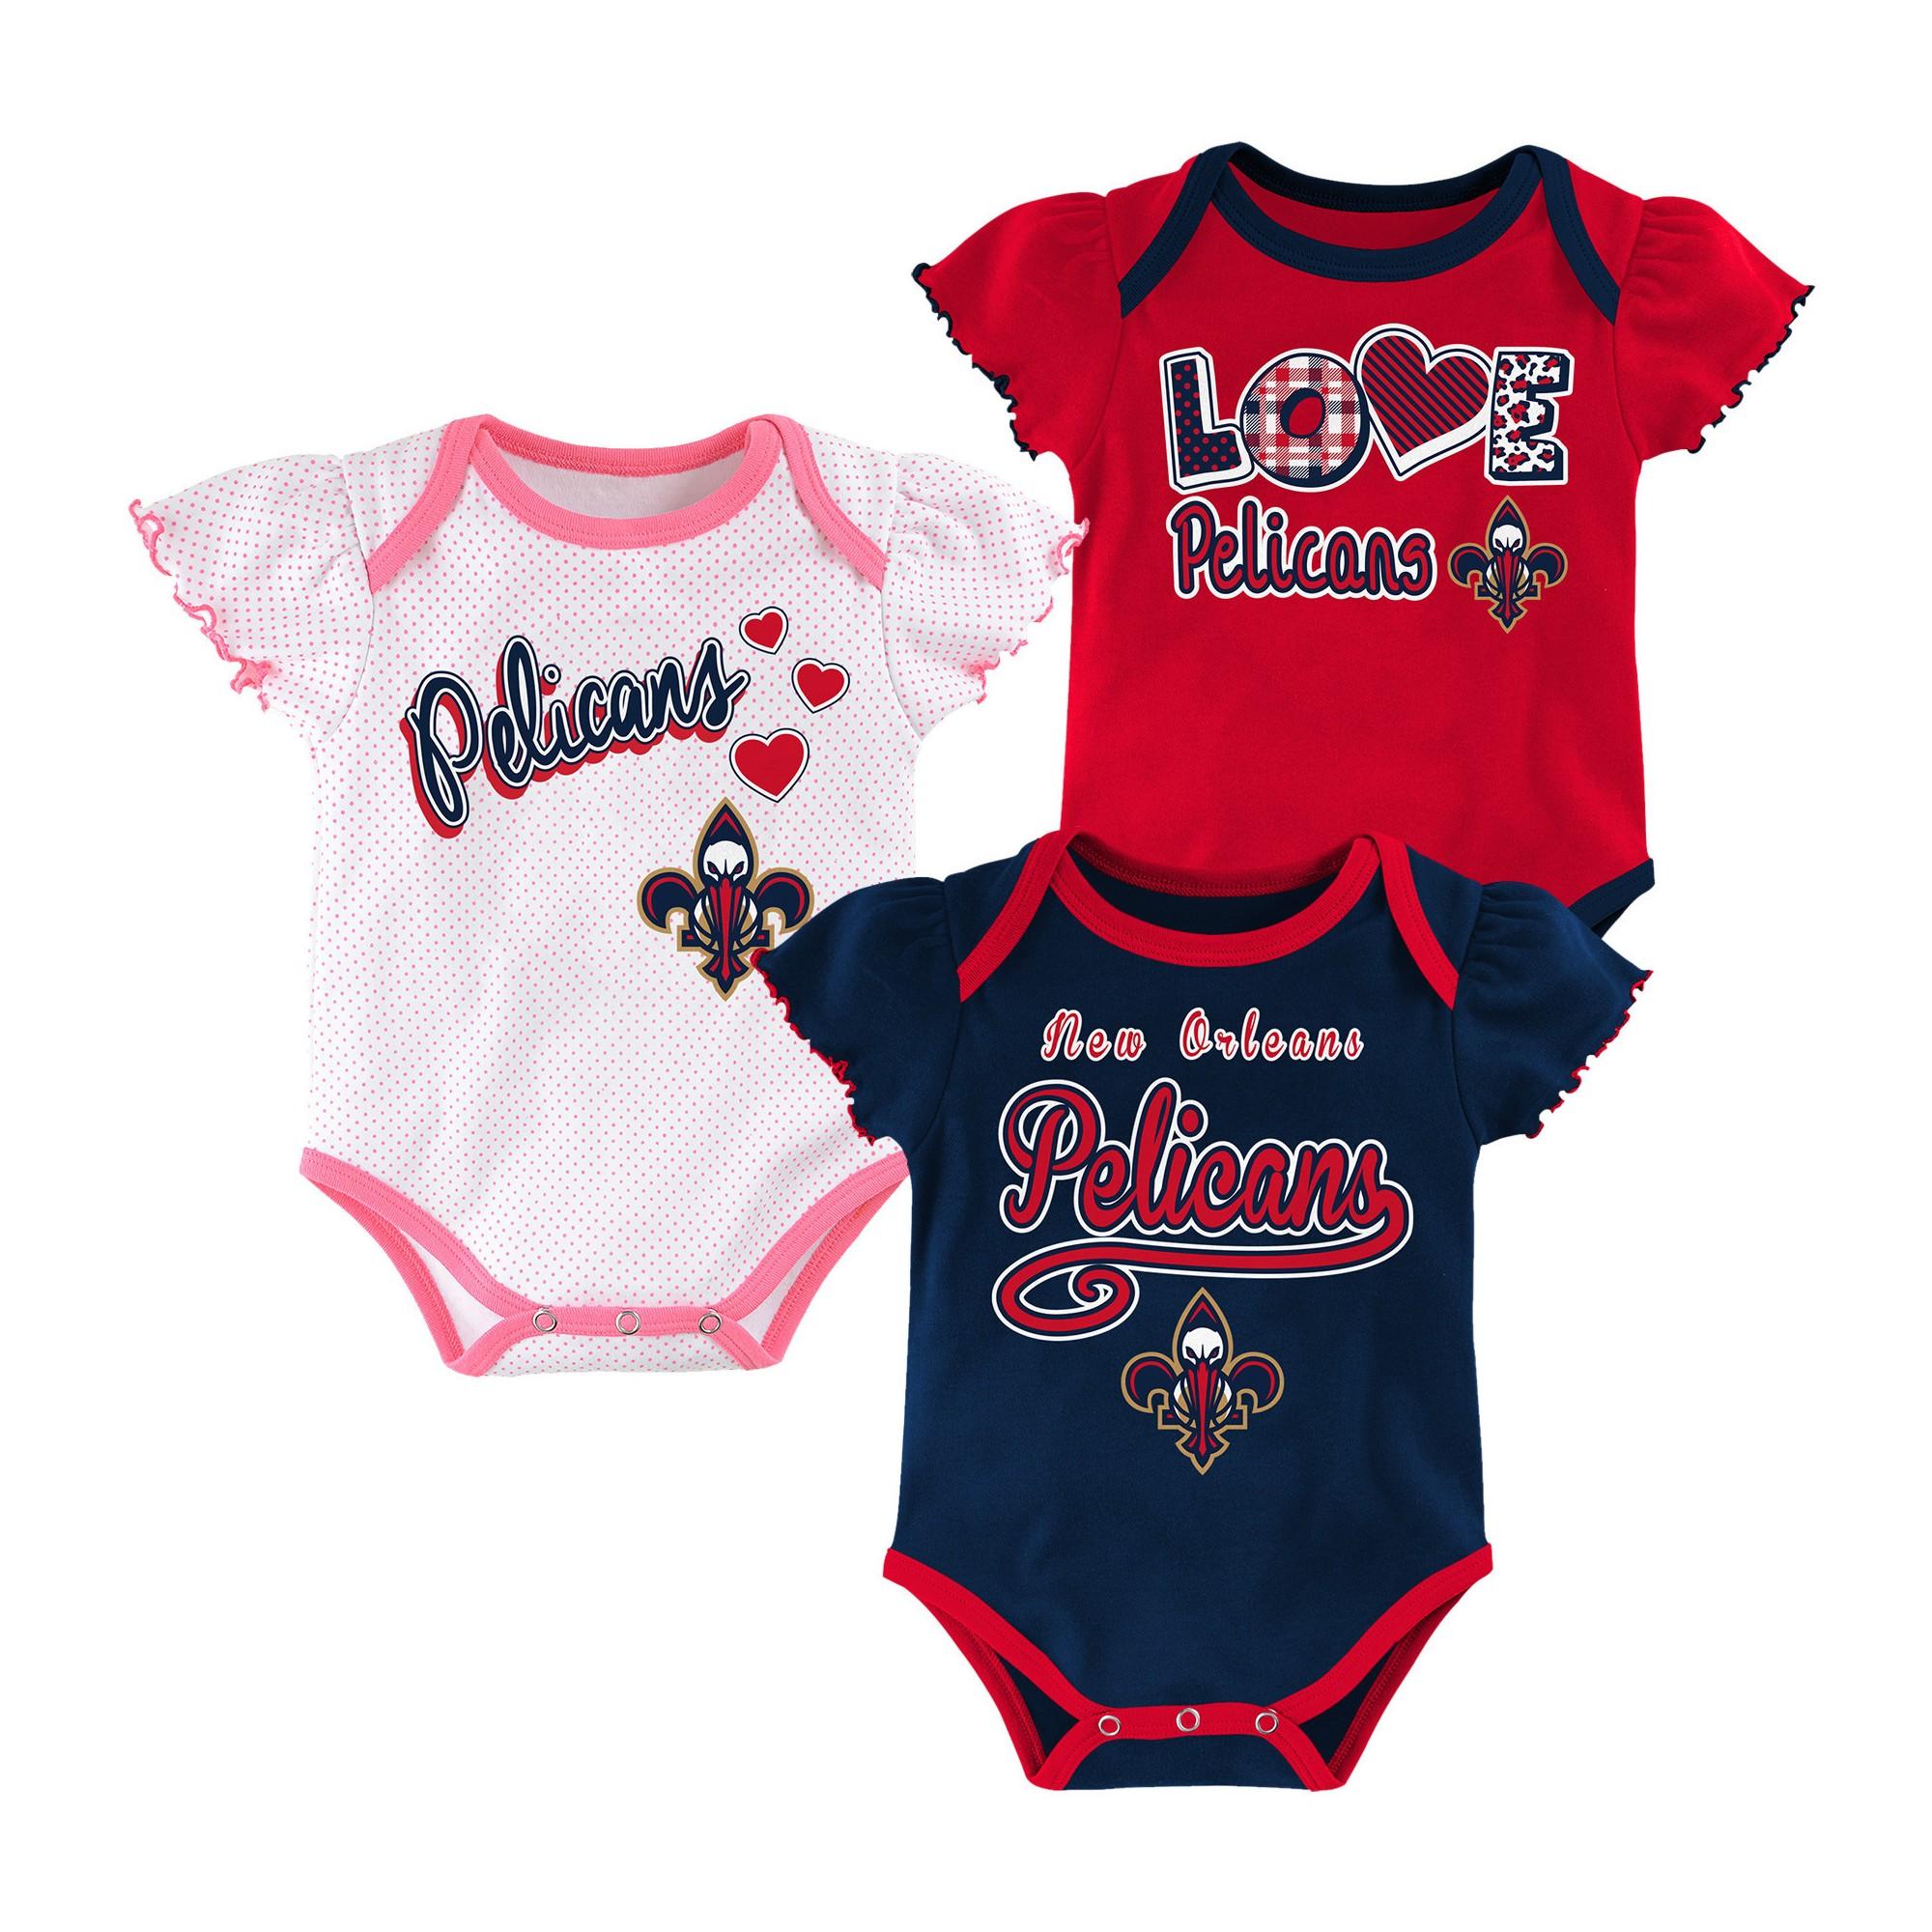 New Orleans Pelicans Baby Girls 3pk Bodysuit Set 3 6 M